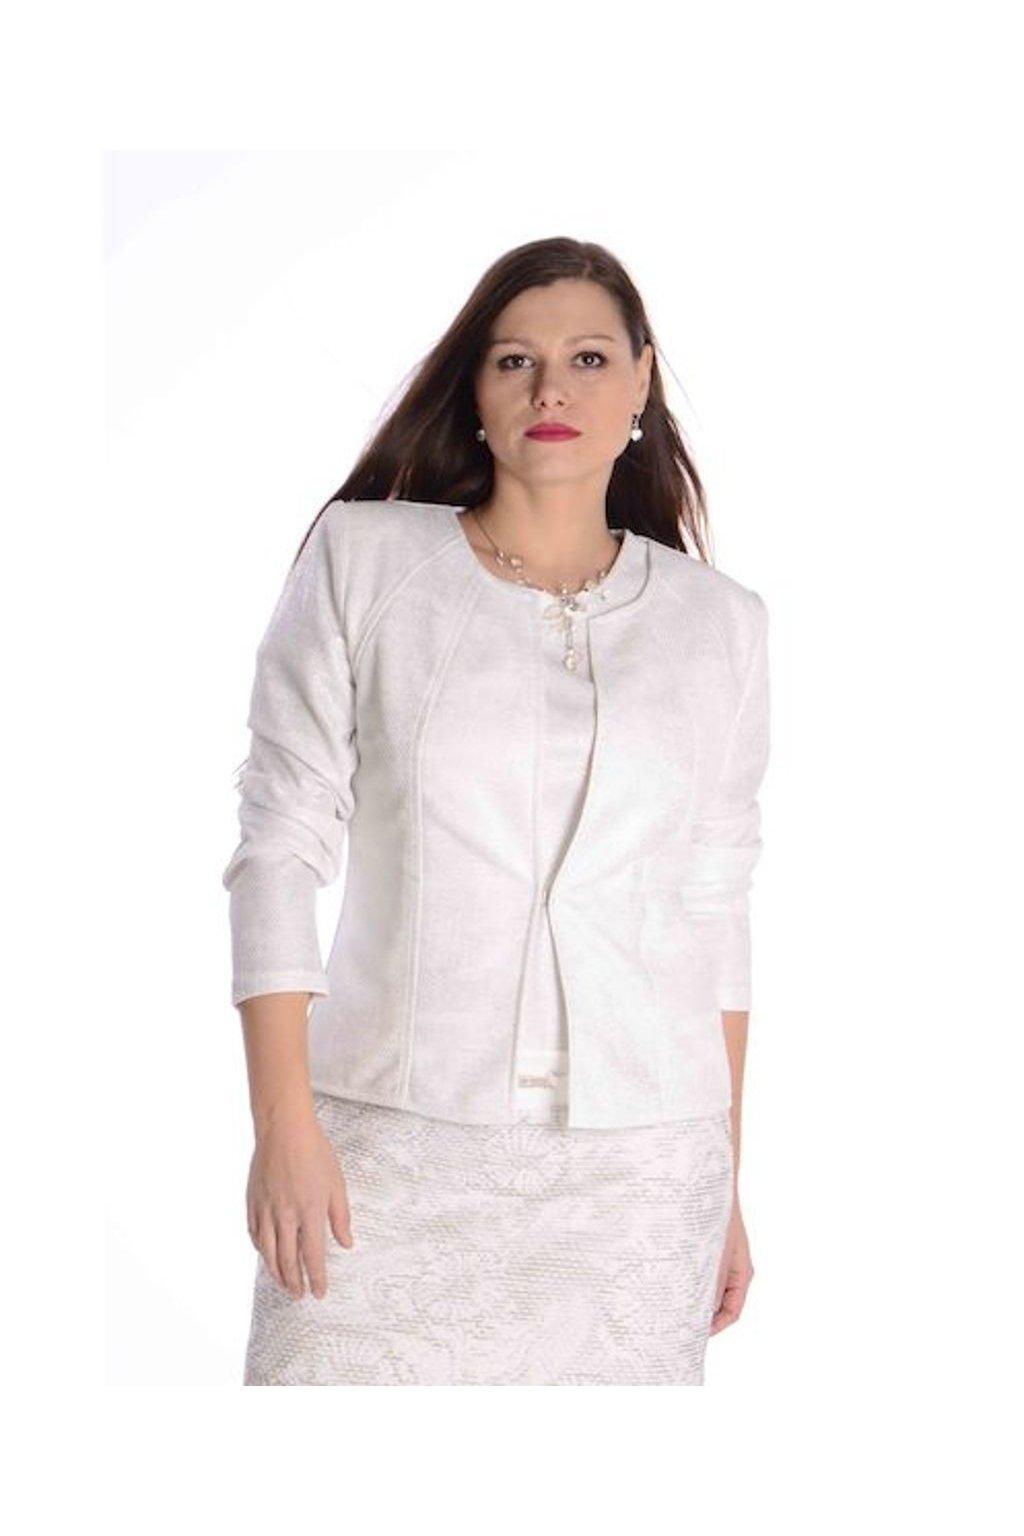 65T Kabátek Charisma (Velikost 36, Barva Smetanová)